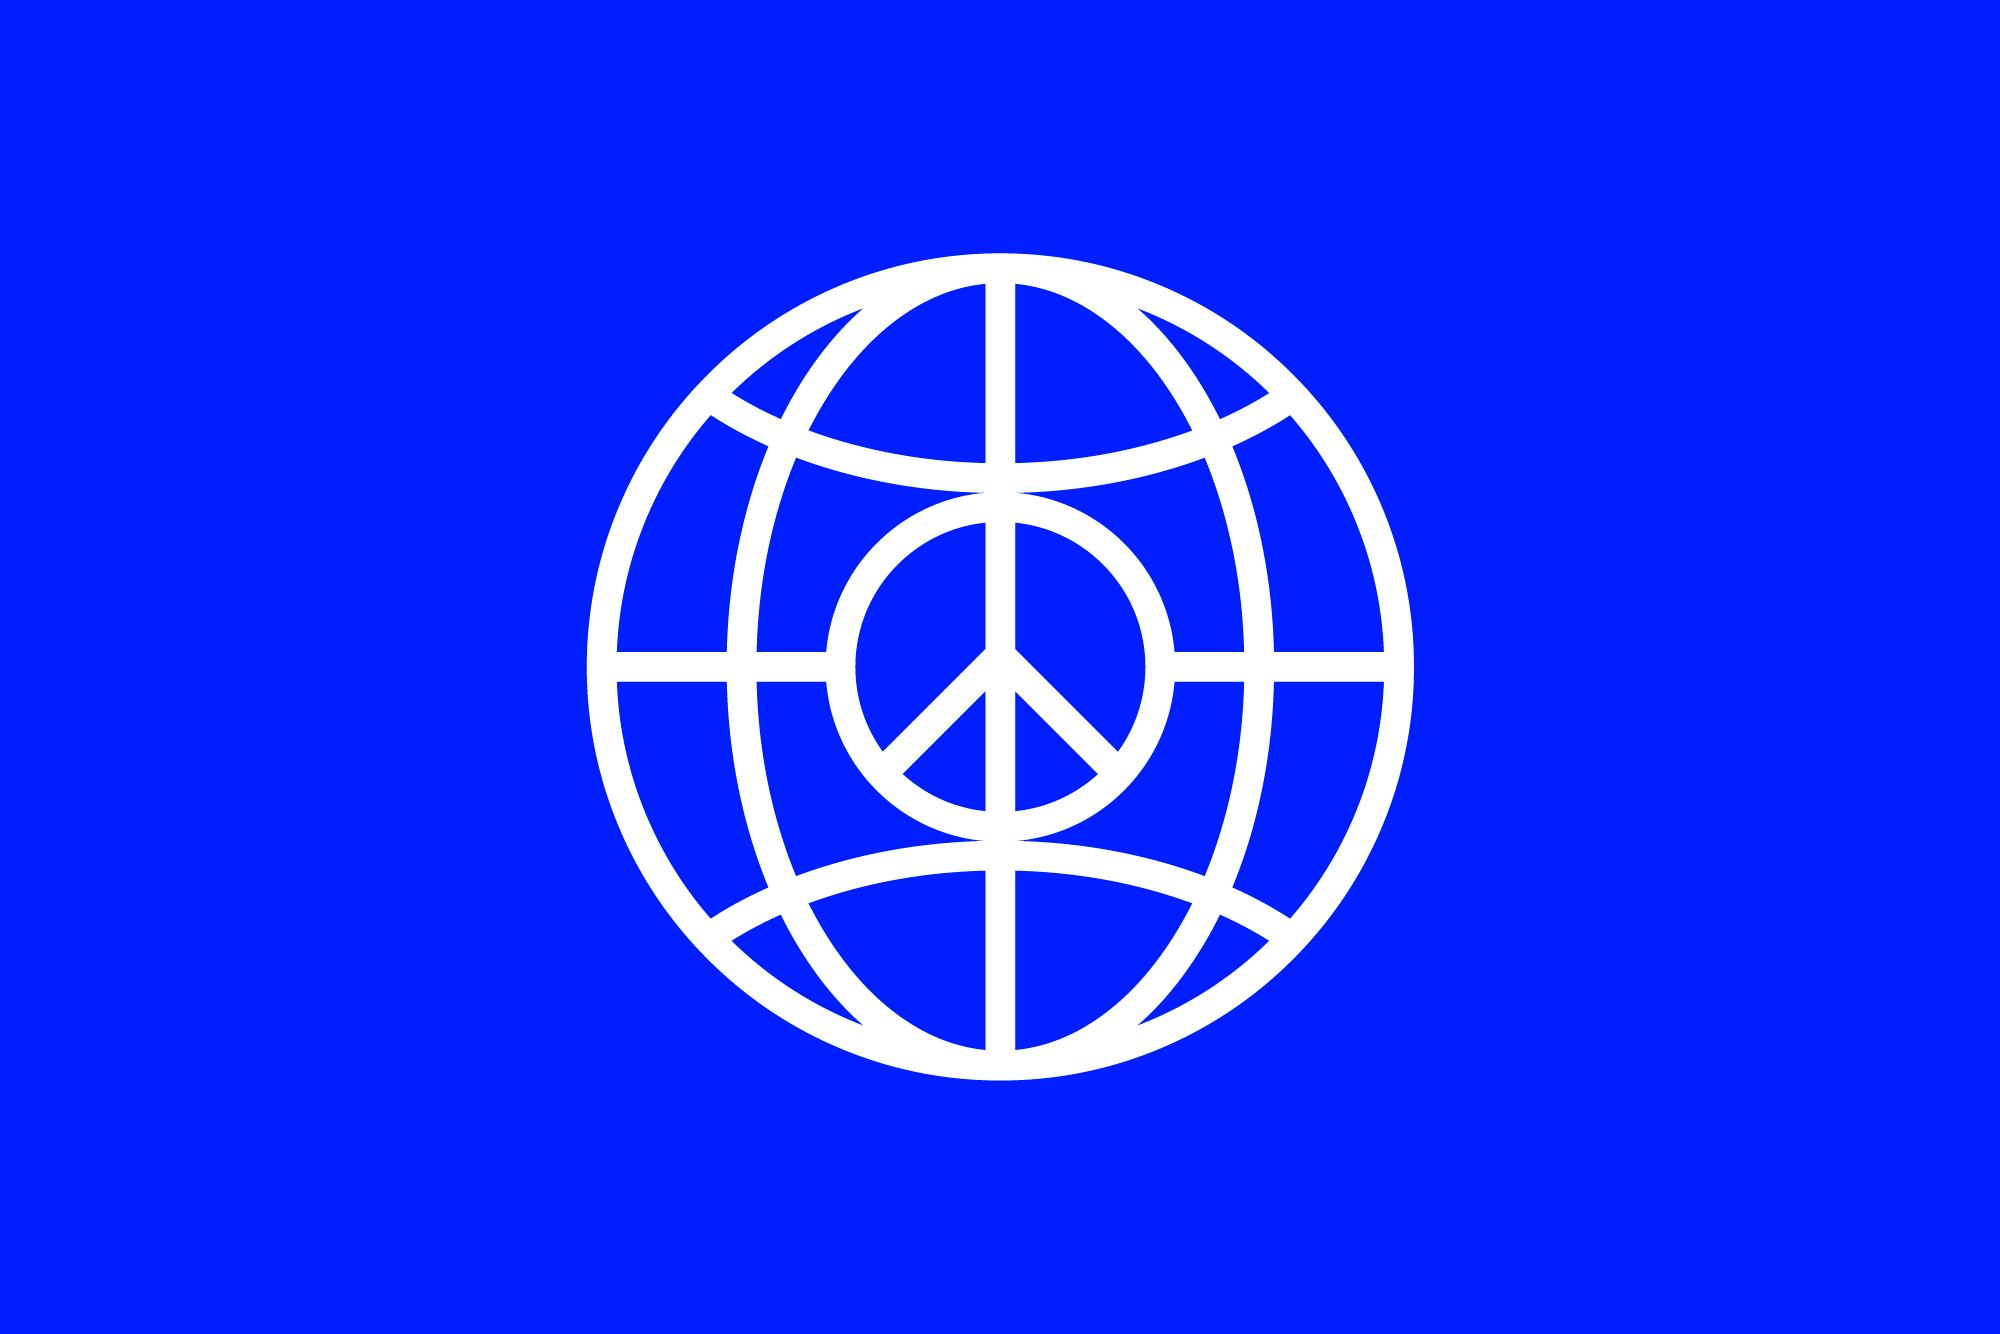 Paz-Mundial-Gabriel-Benderski.png